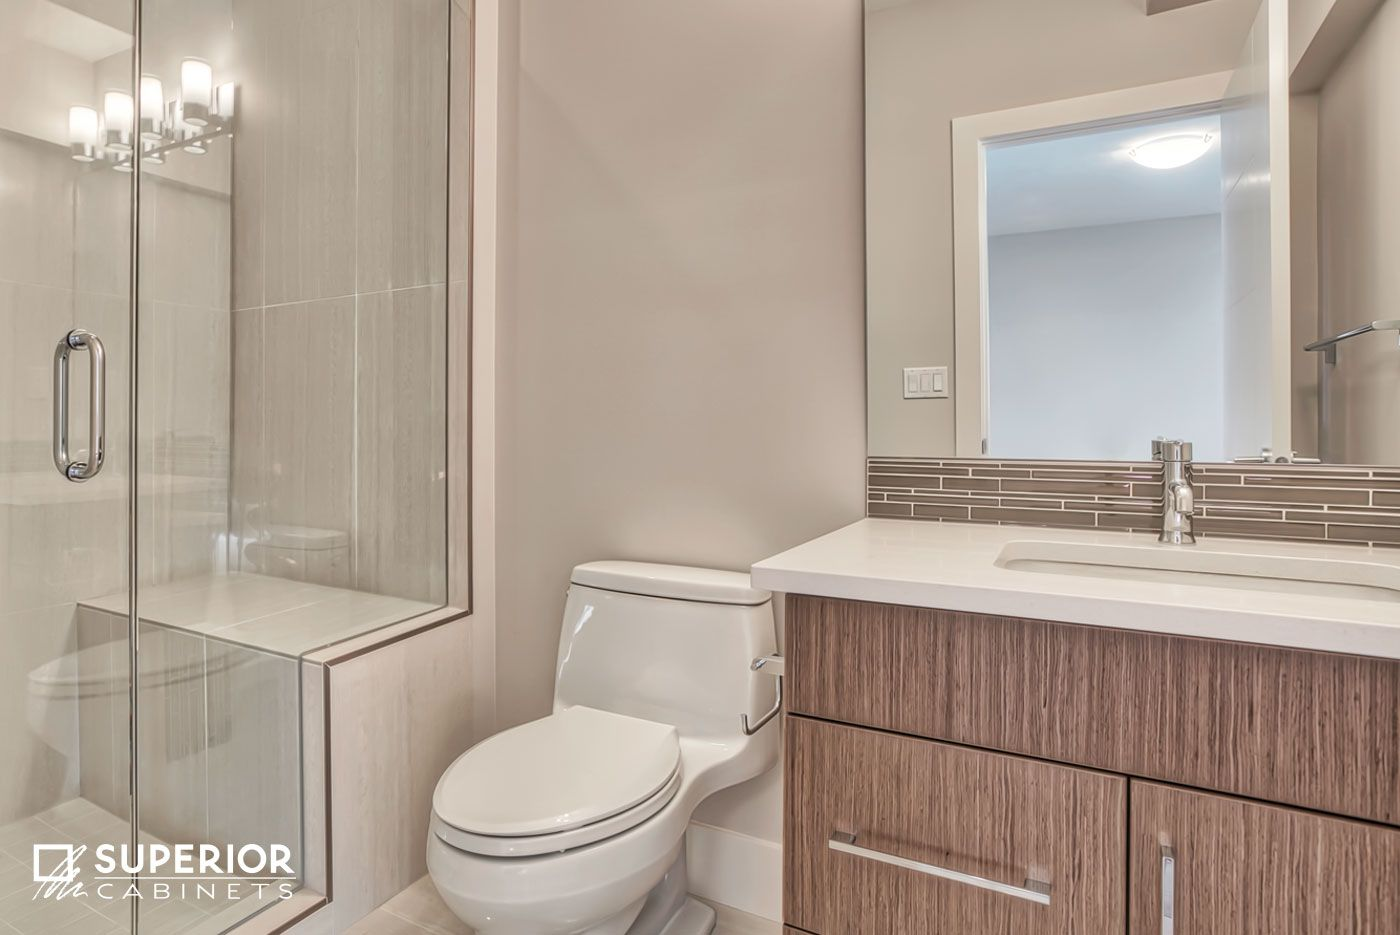 Ekko Ensuite Bathroom Designs Superior Cabinets Bathroom Design